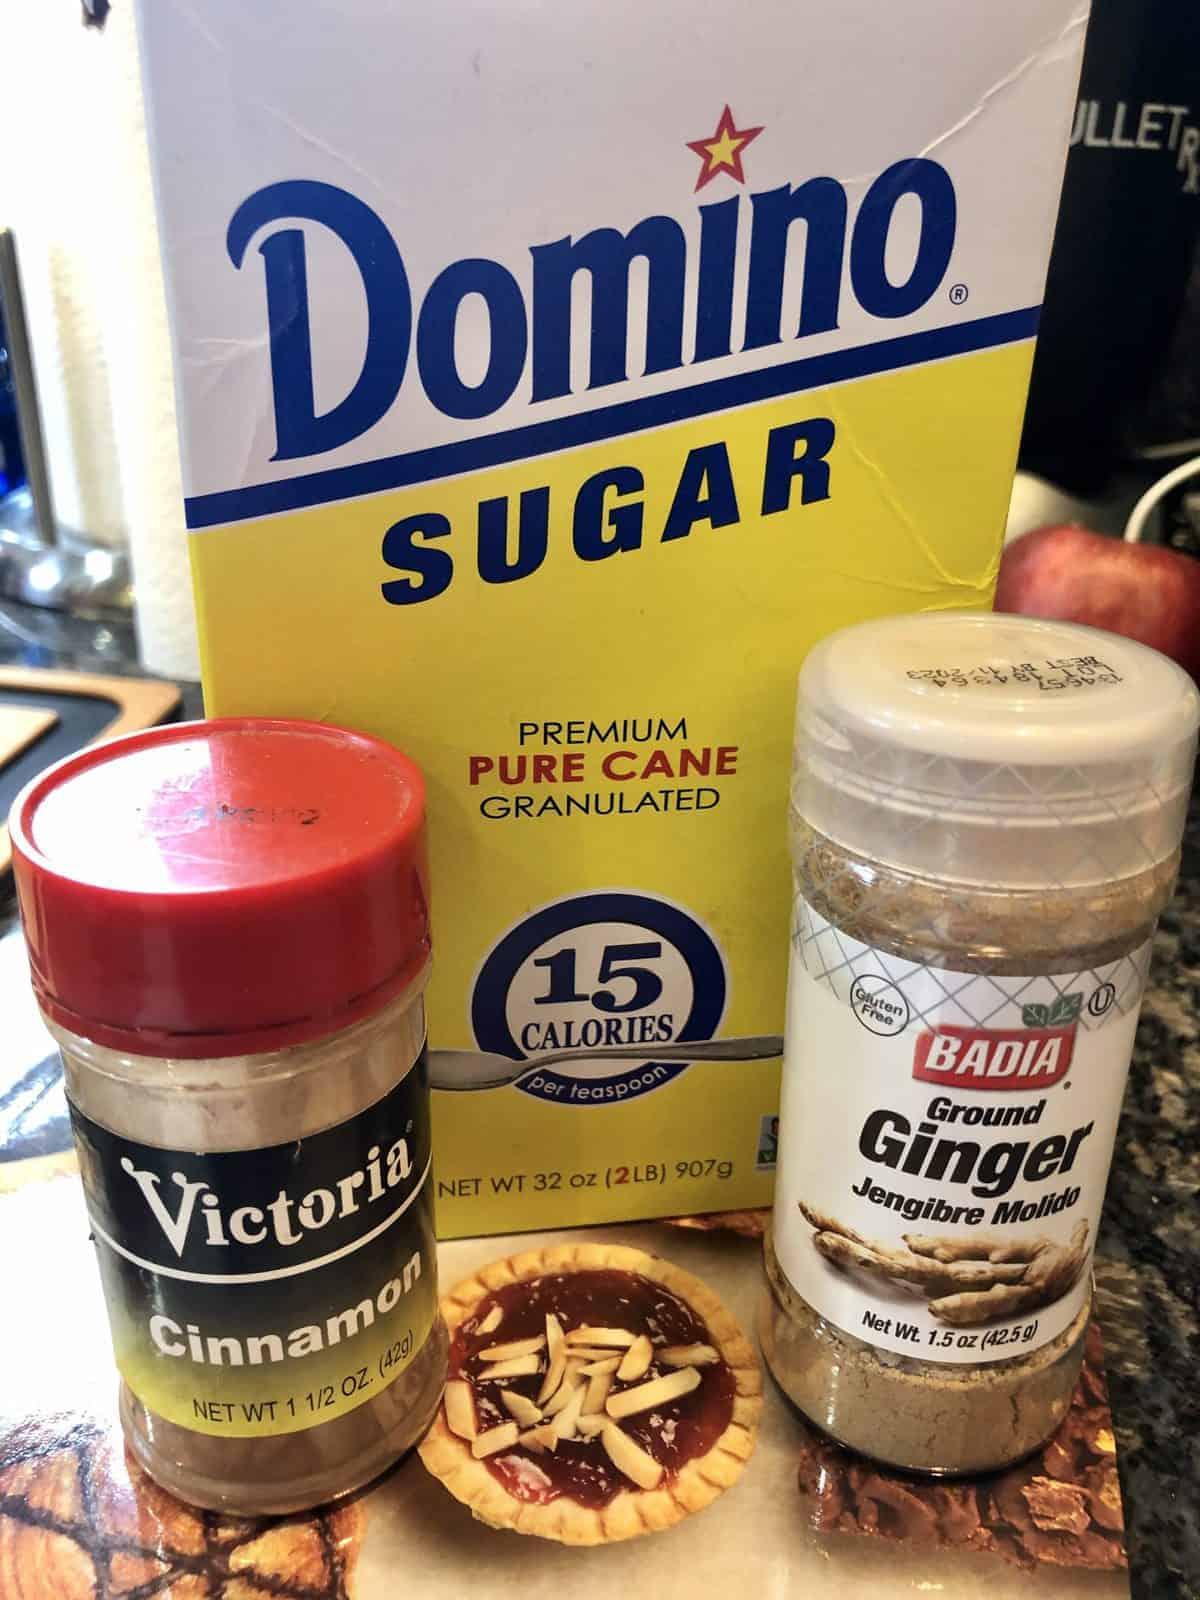 Sugar Cinnamon and Ginger Ingredient for Baked Apple Crisps